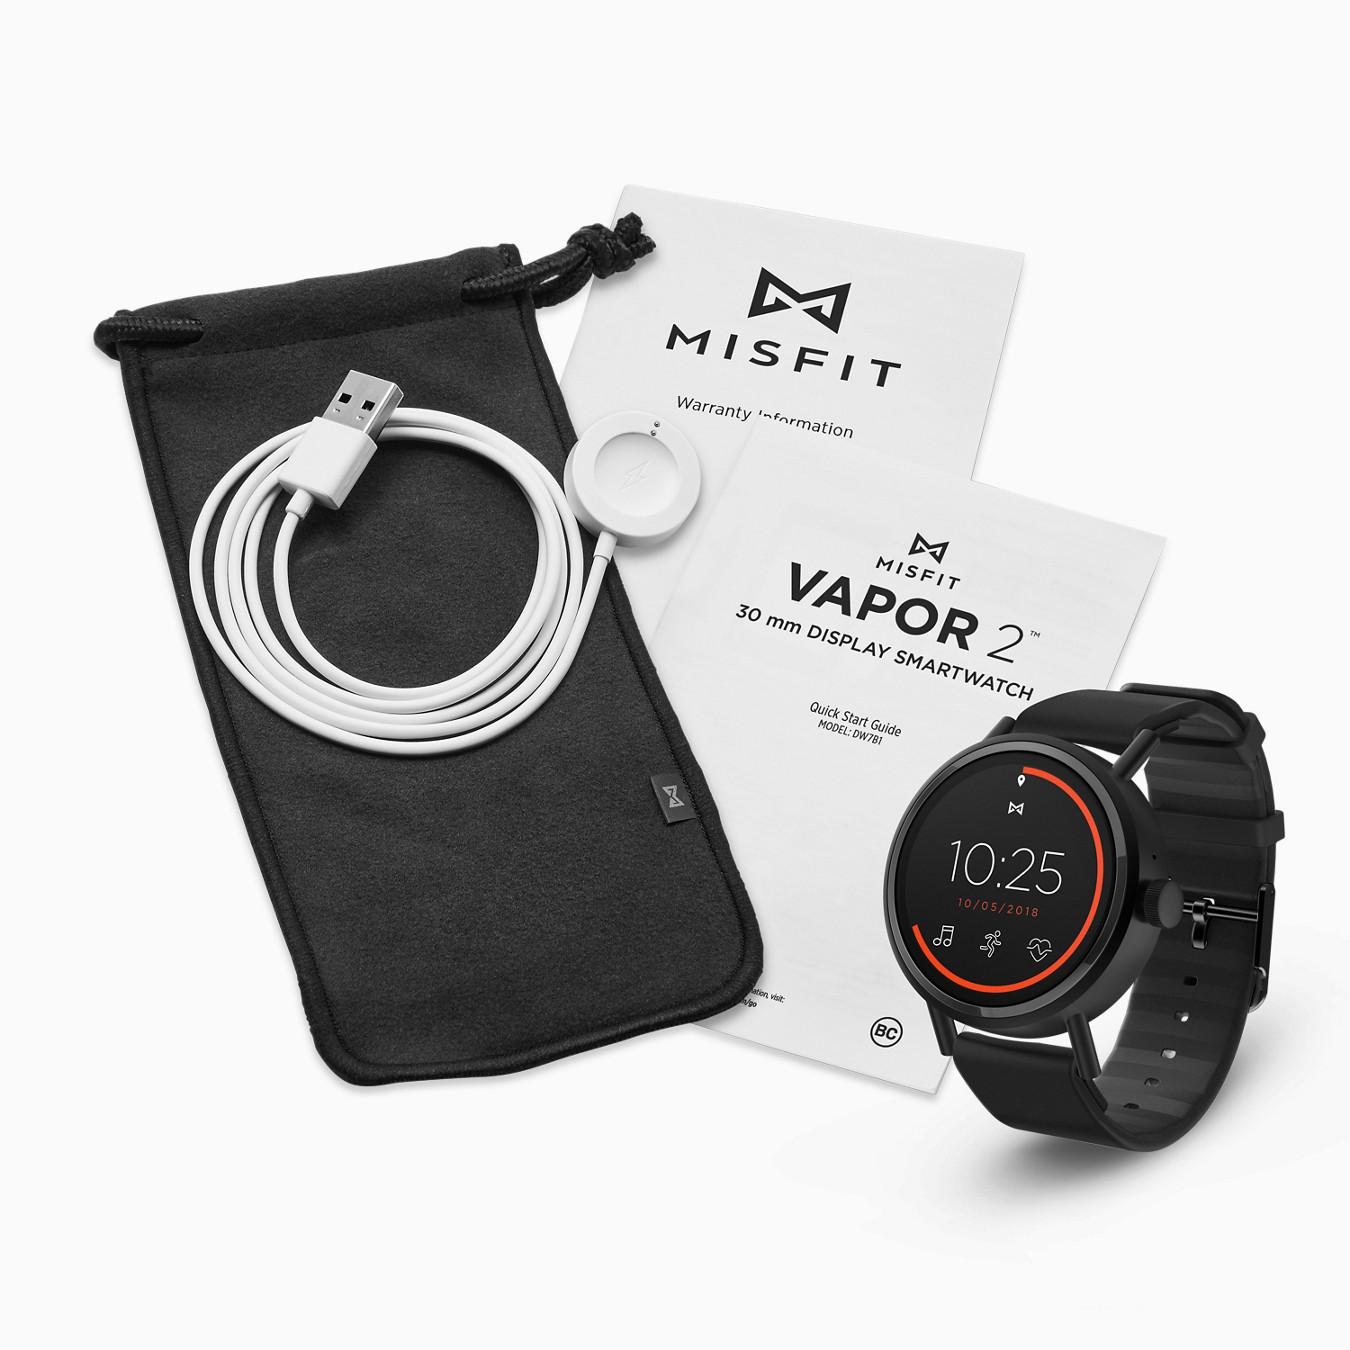 Misfit Vapor 2 Smartwatch - Misfit